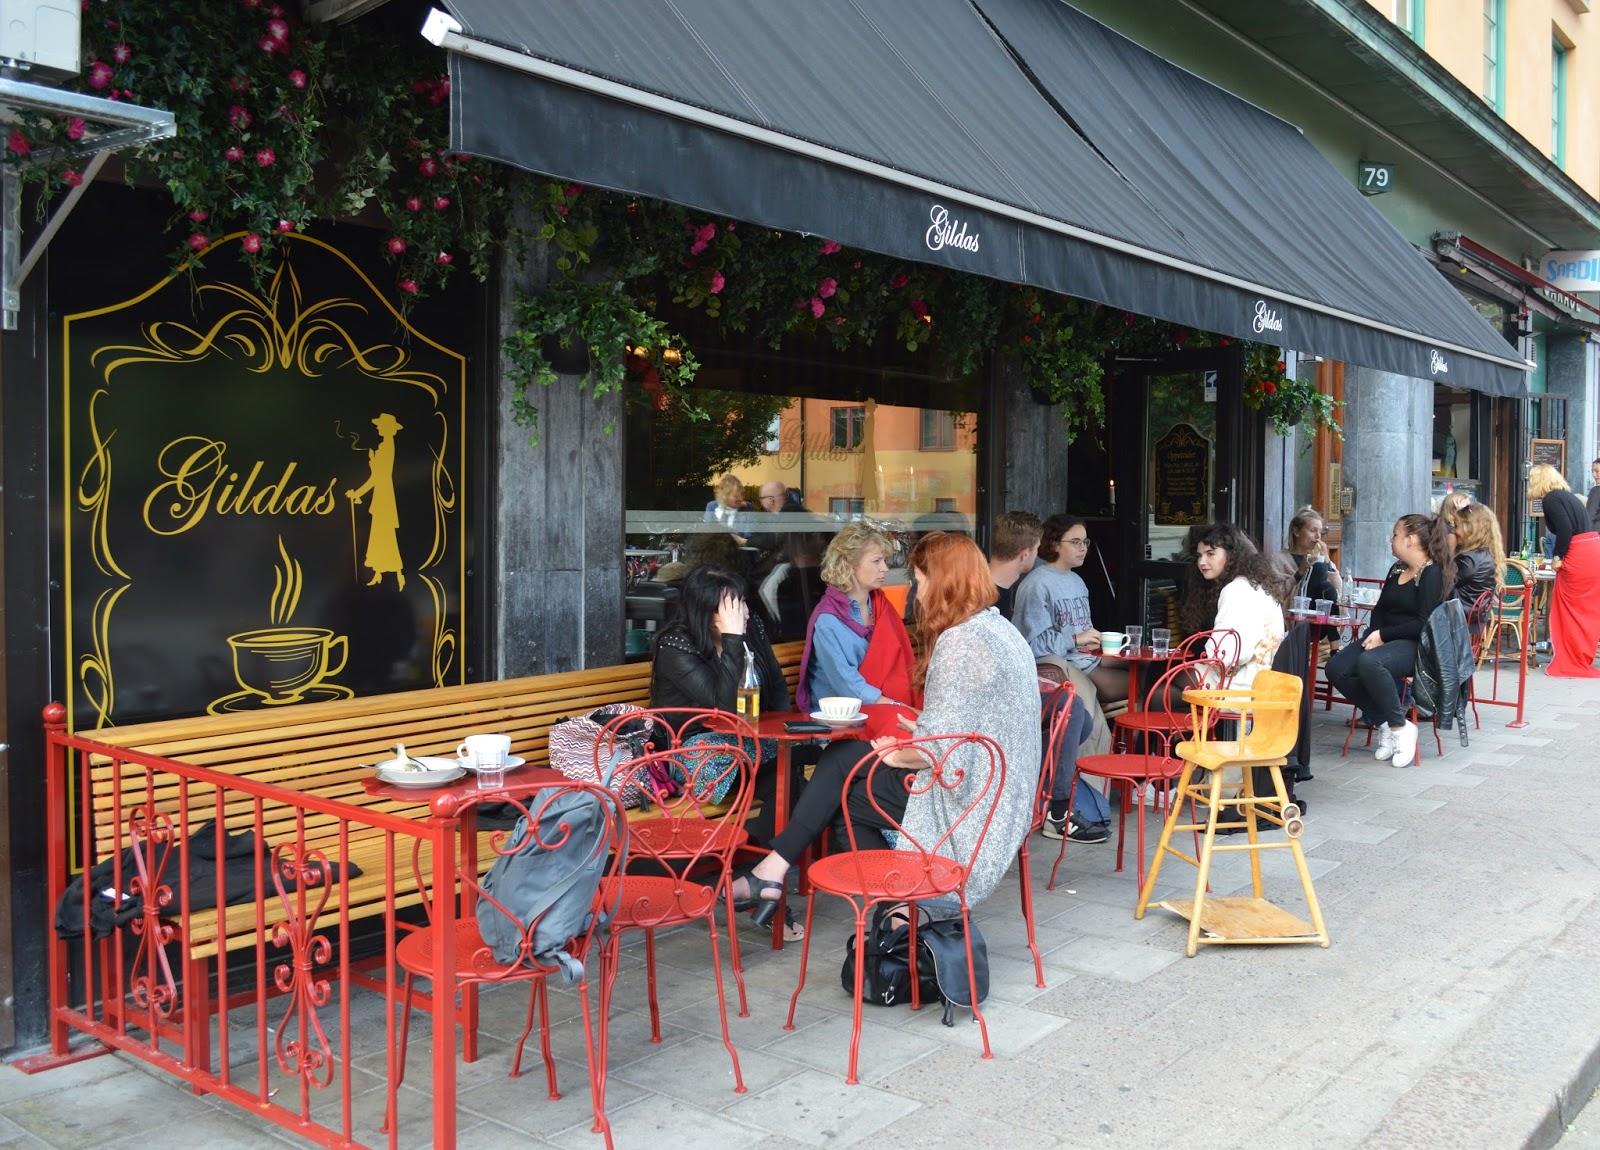 Outside Gildas Rum cafe in Södermalm, Stockholm